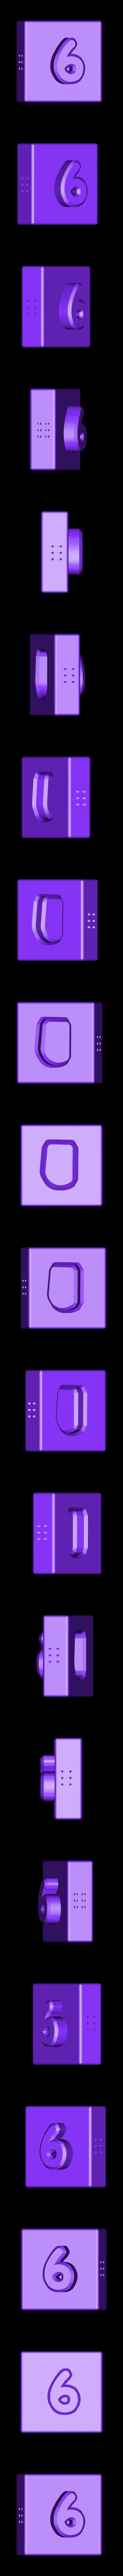 6.stl Download free STL file Mental blocks • Object to 3D print, RevK